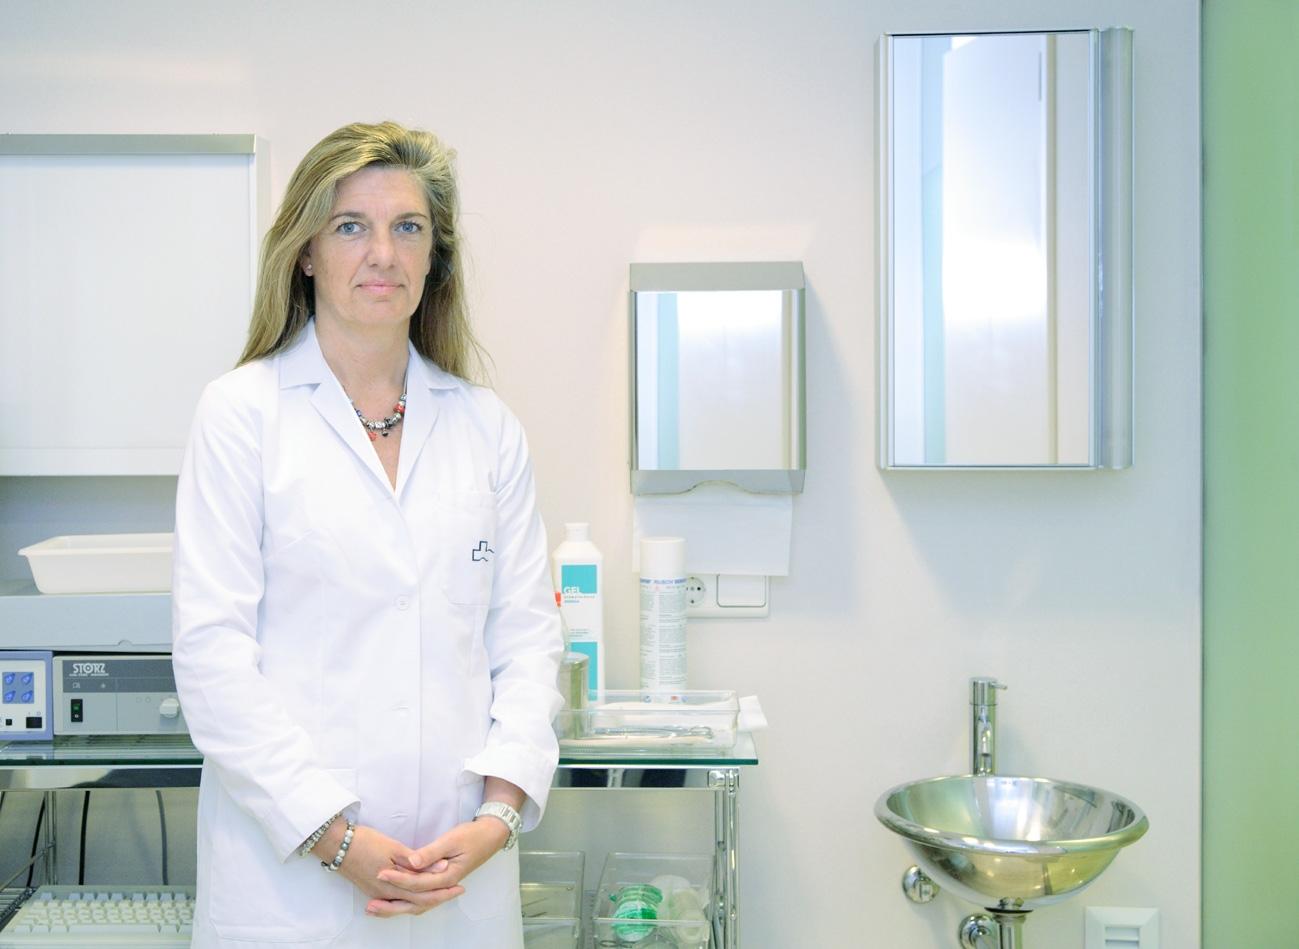 Clínica Rinològica Maria Colomé - Equip Mercè